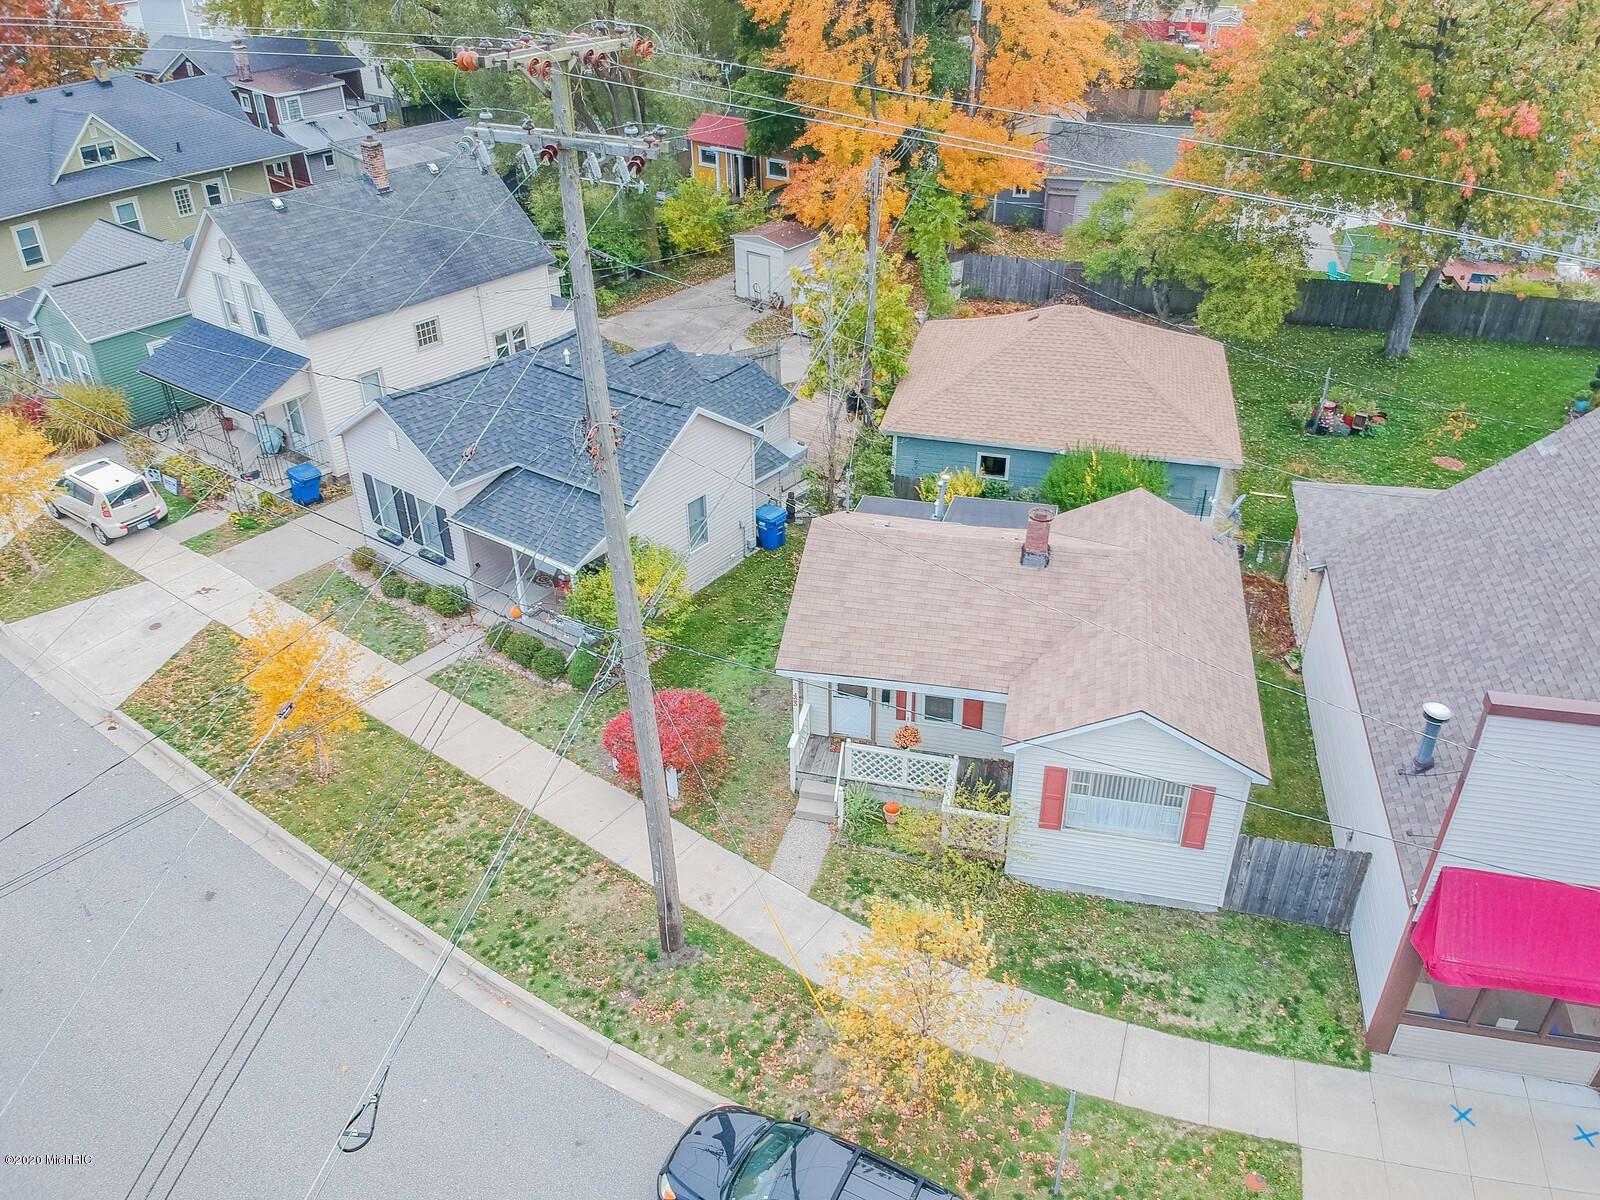 Photo of 423 N 6th Street, Grand Haven, MI 49417 (MLS # 20045852)